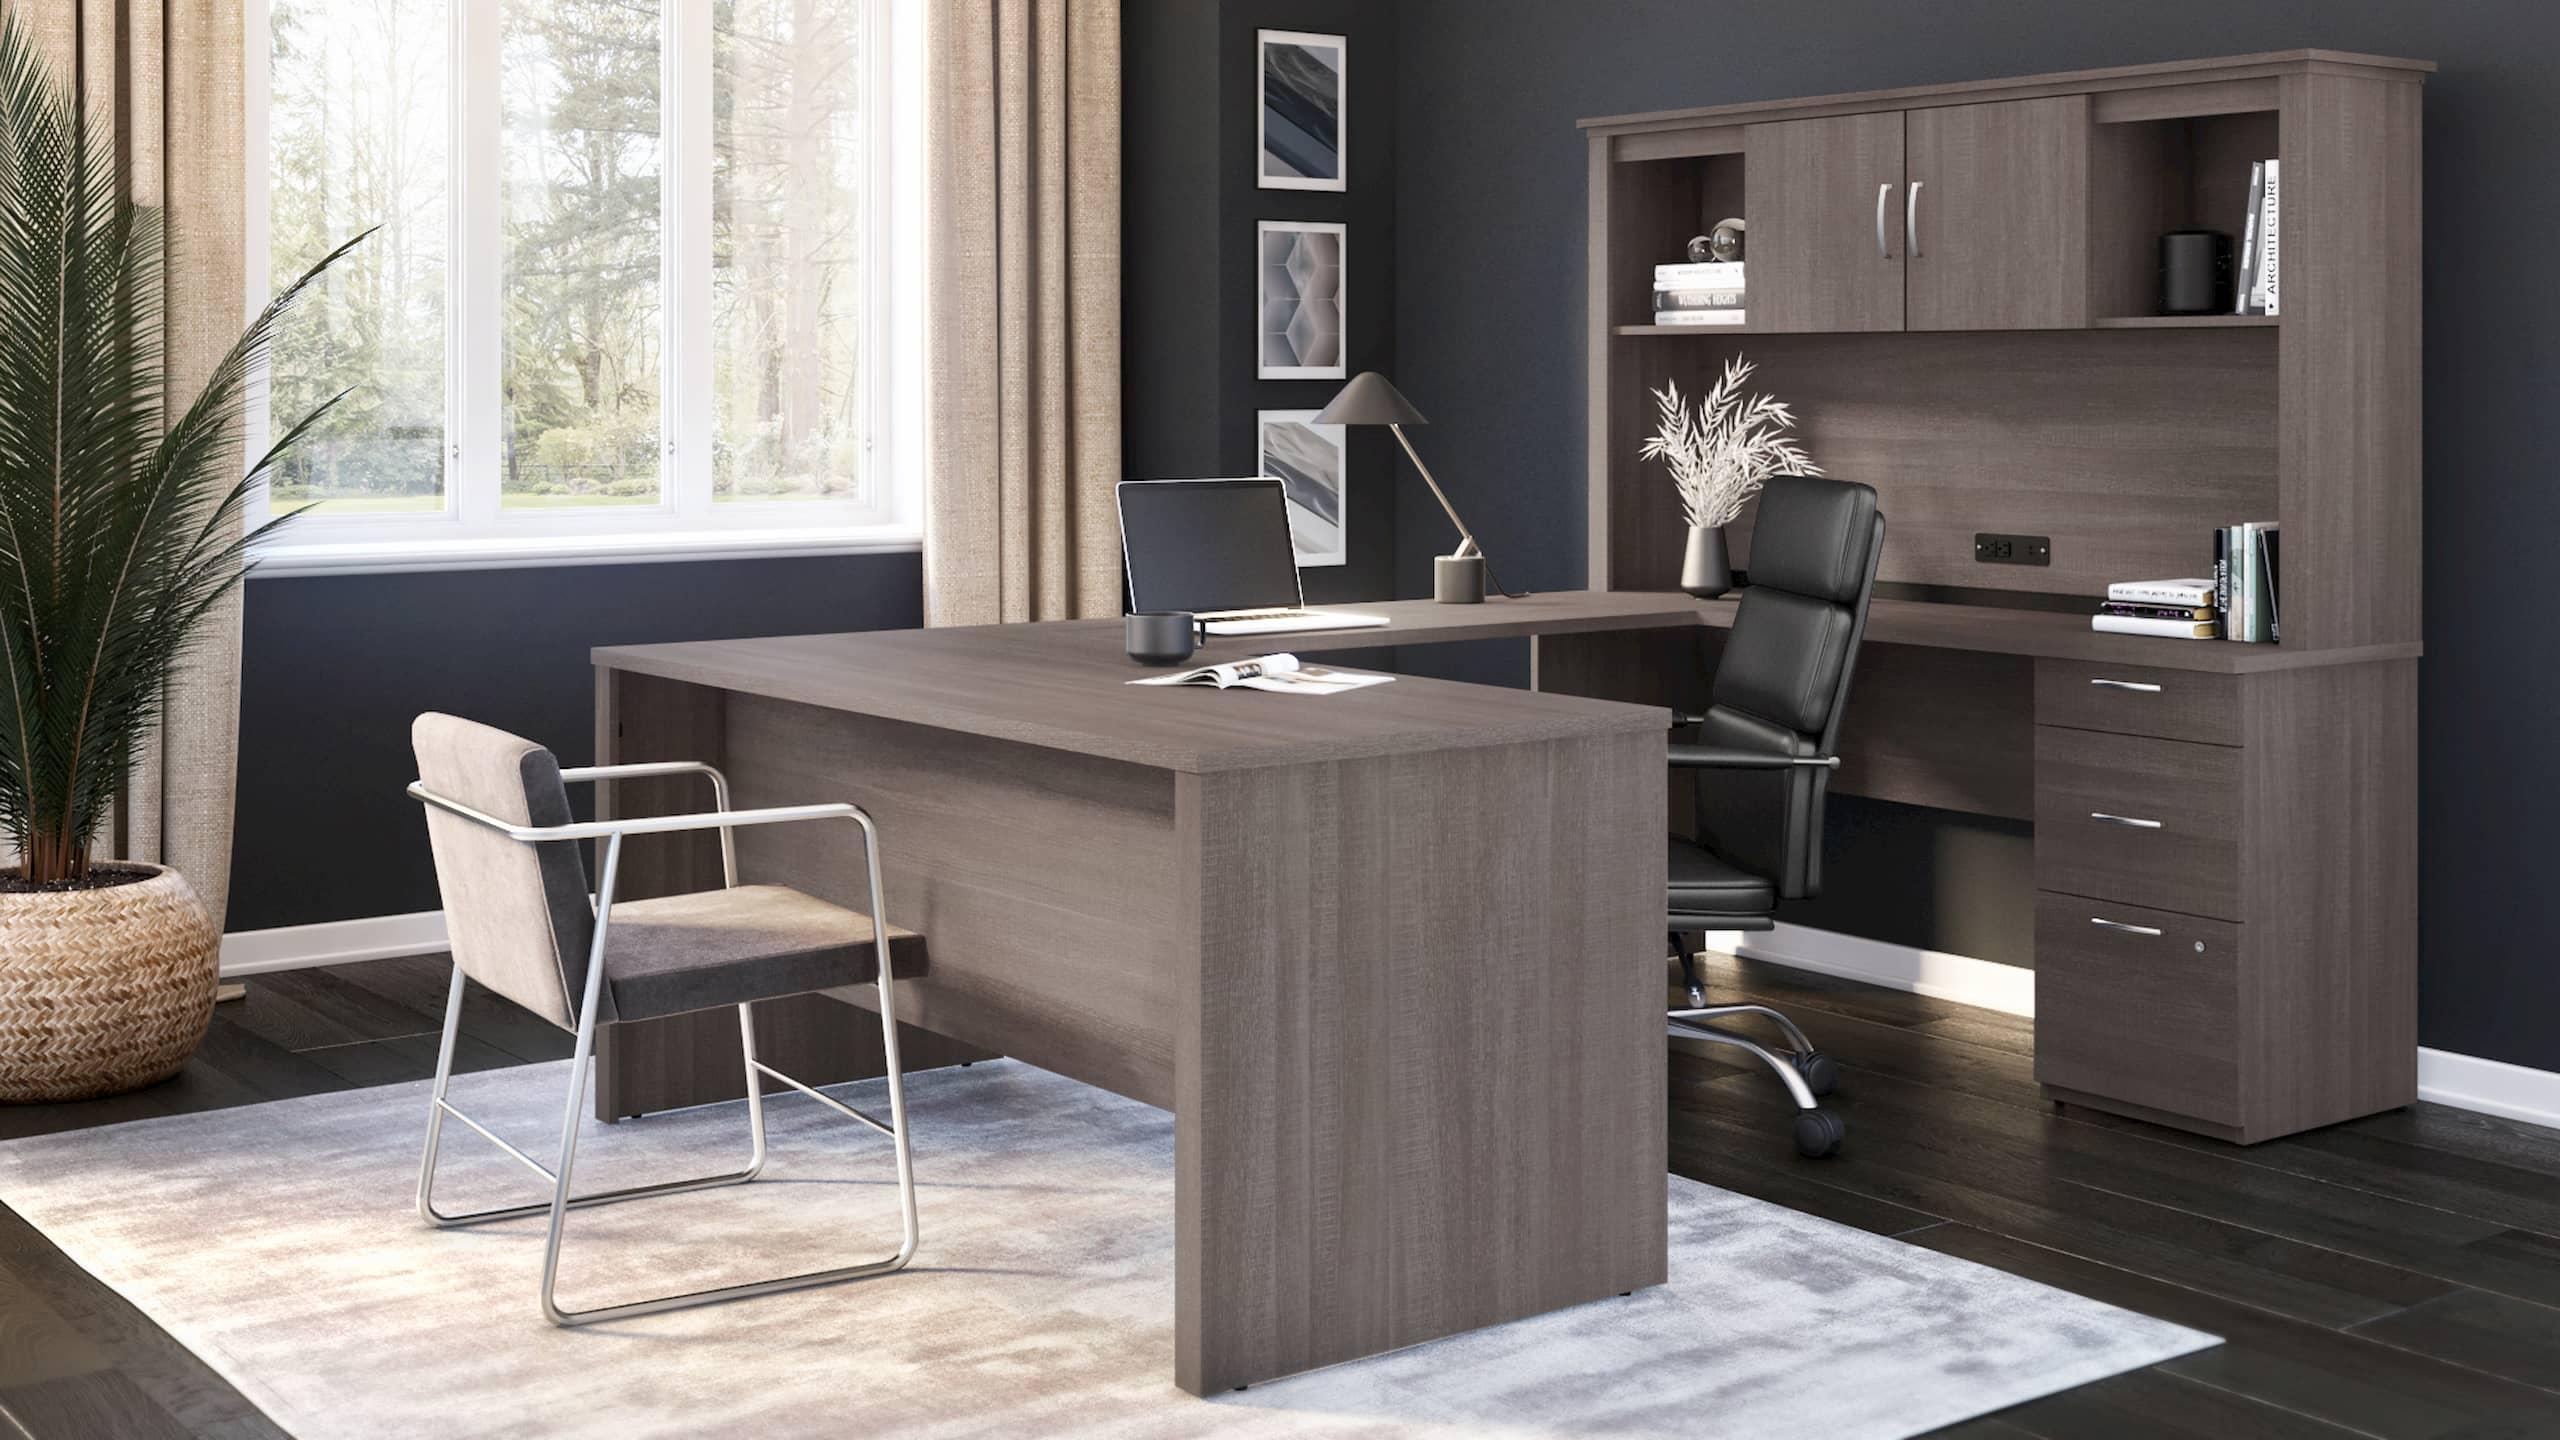 Bestar U-Shaped Desk with Storage